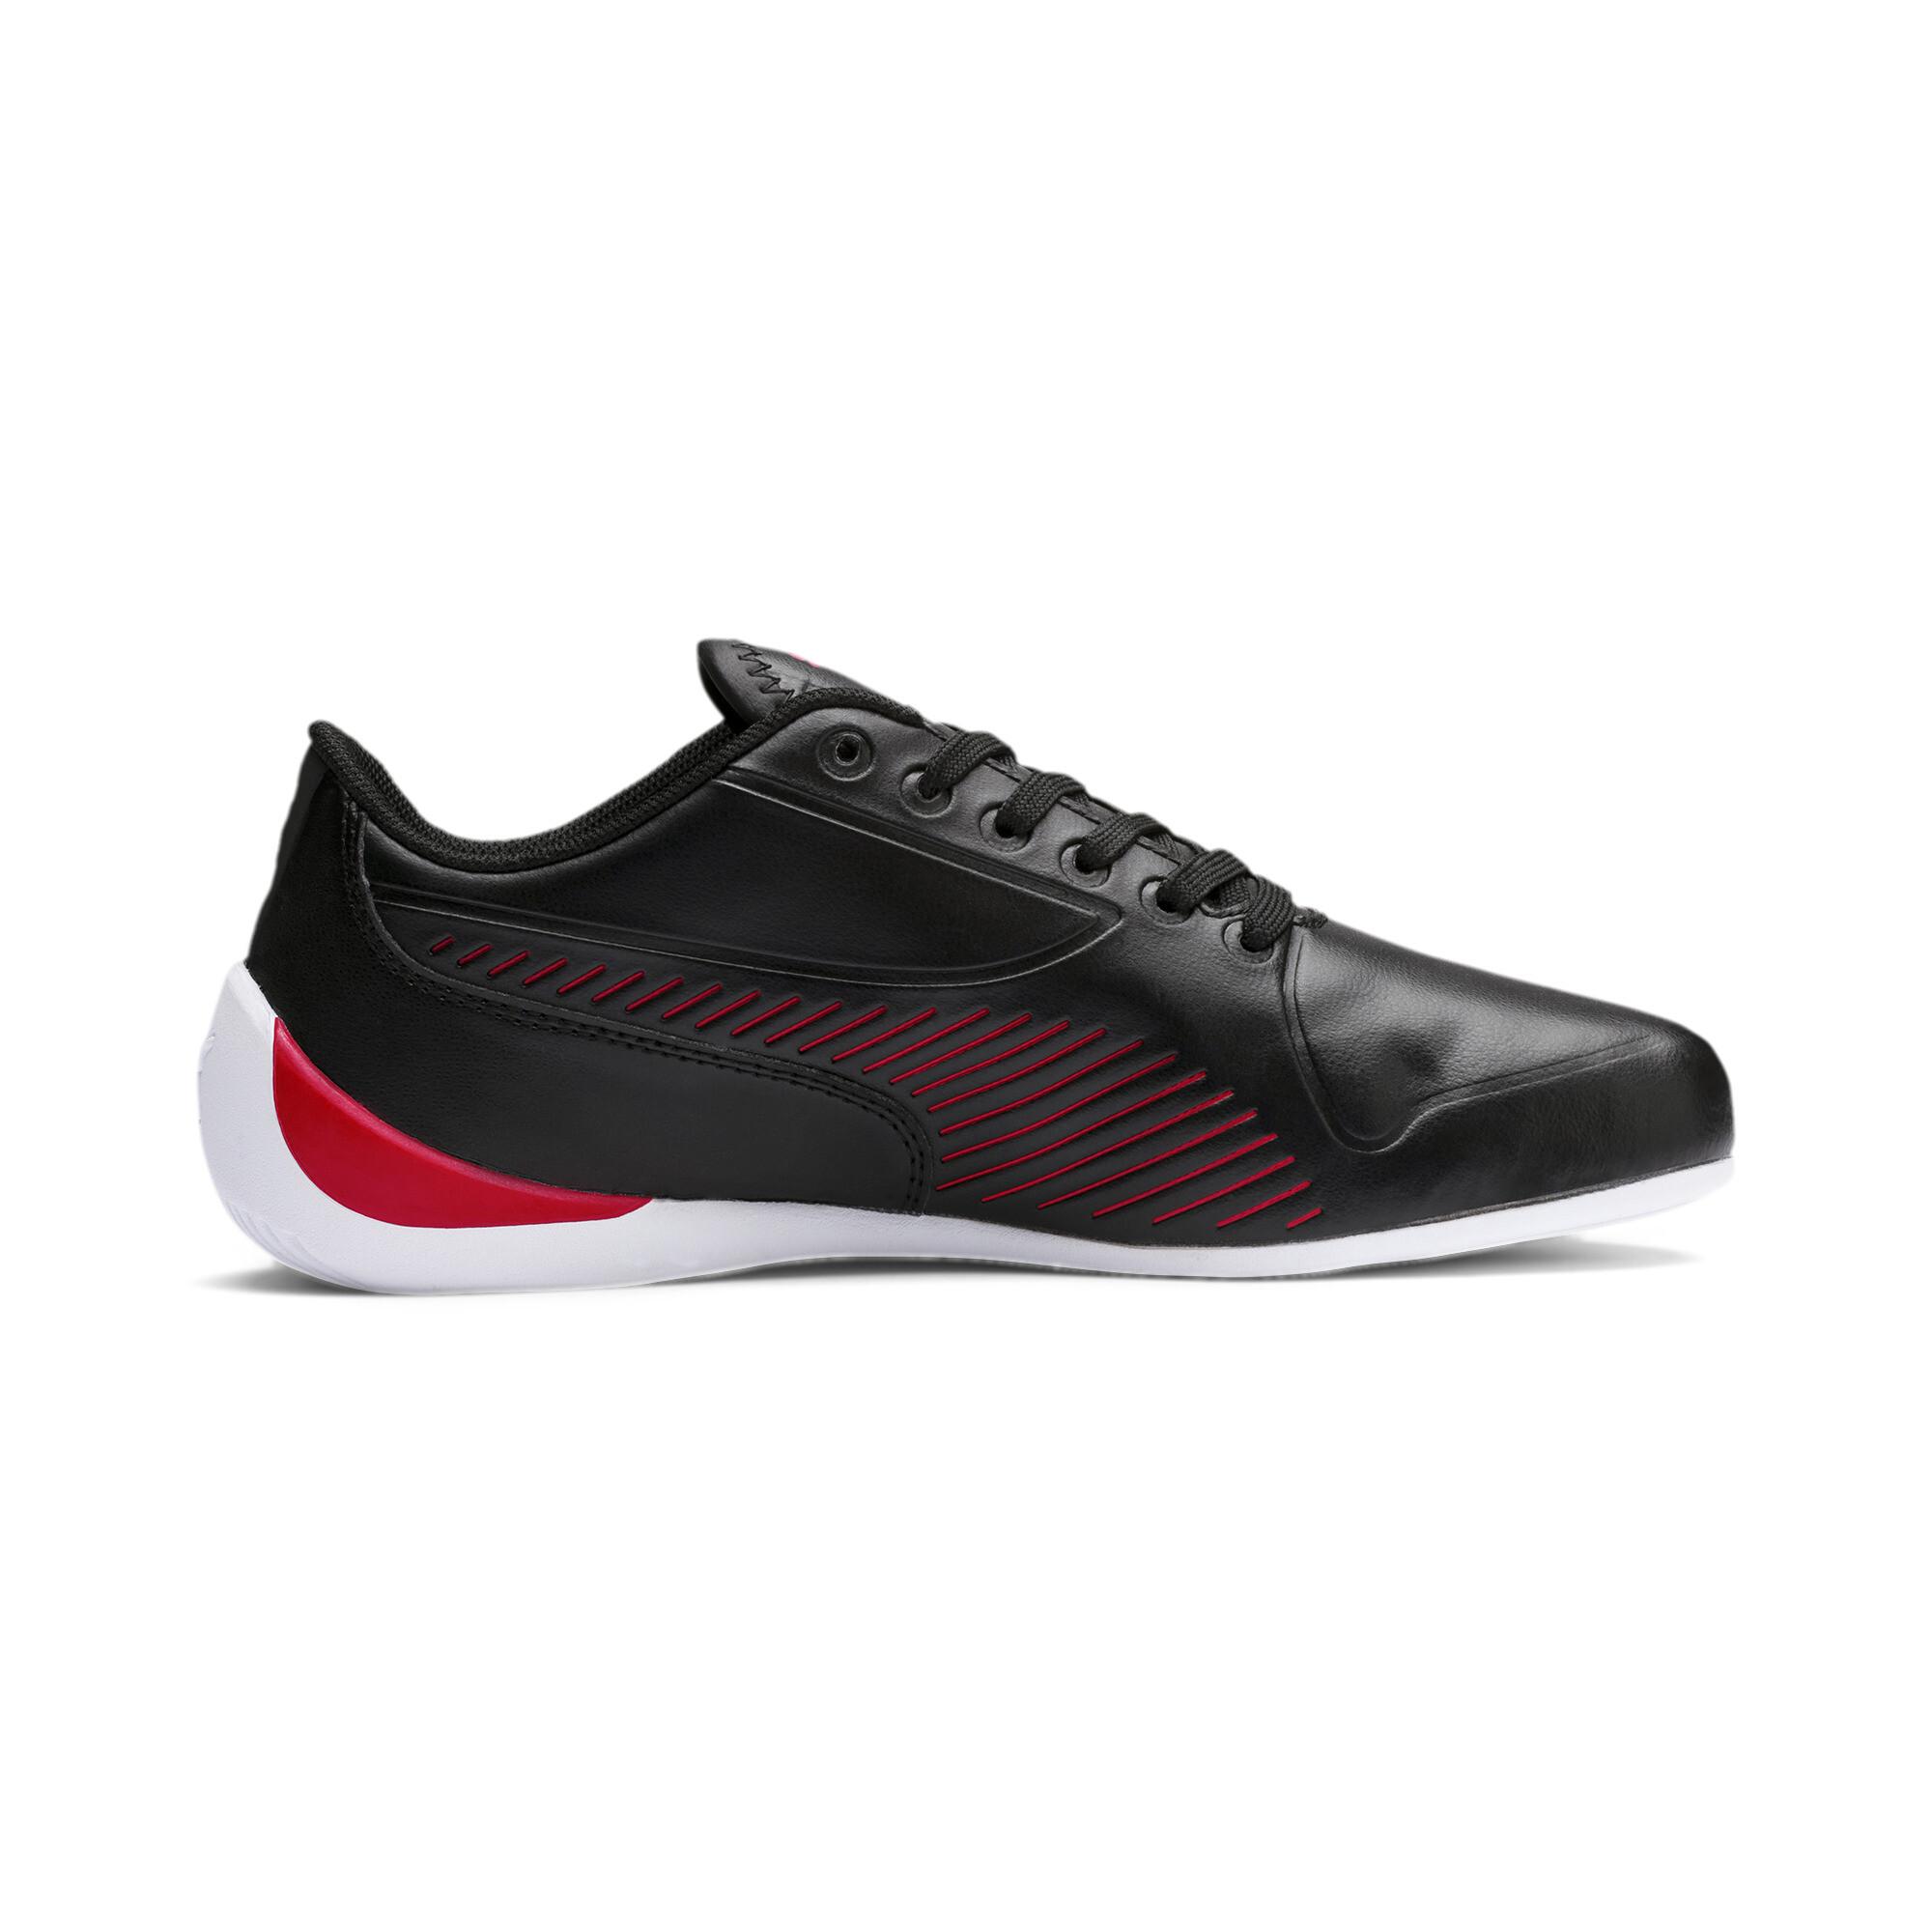 a03440e113 Details about PUMA Scuderia Ferrari Drift Cat 7S Ultra Shoes JR Kids Shoe  Auto